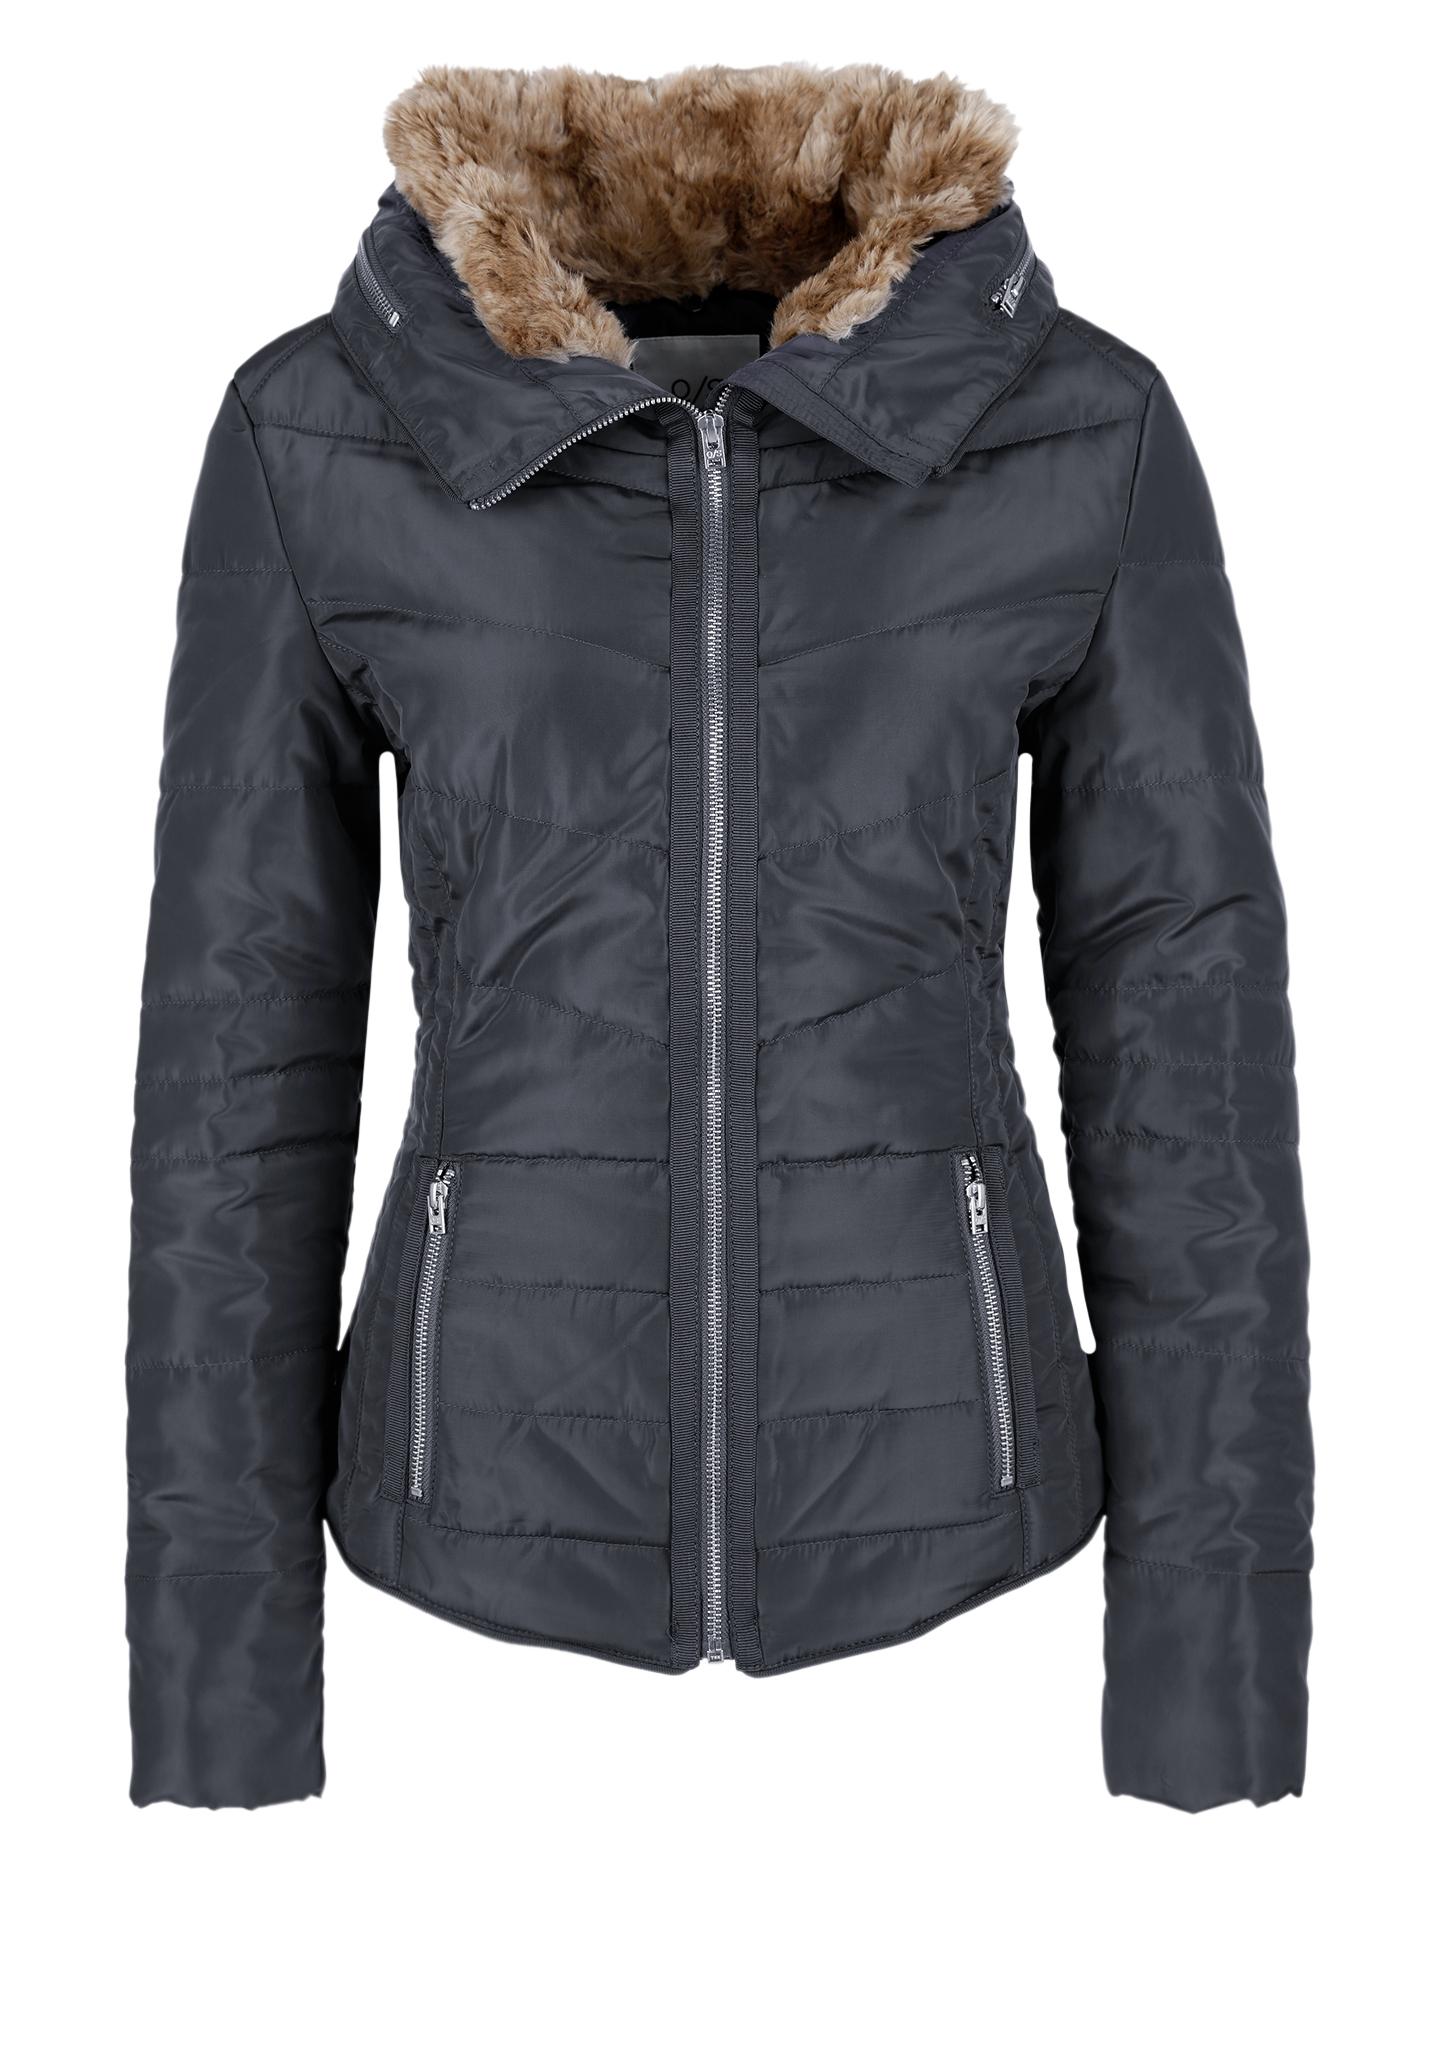 Outdoor-Jacke | Sportbekleidung > Sportjacken > Outdoorjacken | Grau/schwarz | Obermaterial 100% polyester| kunstpelz 85% polyacryl -  15% polyester futter 100% polyester| füllmaterial 100%  polyester | Q/S designed by